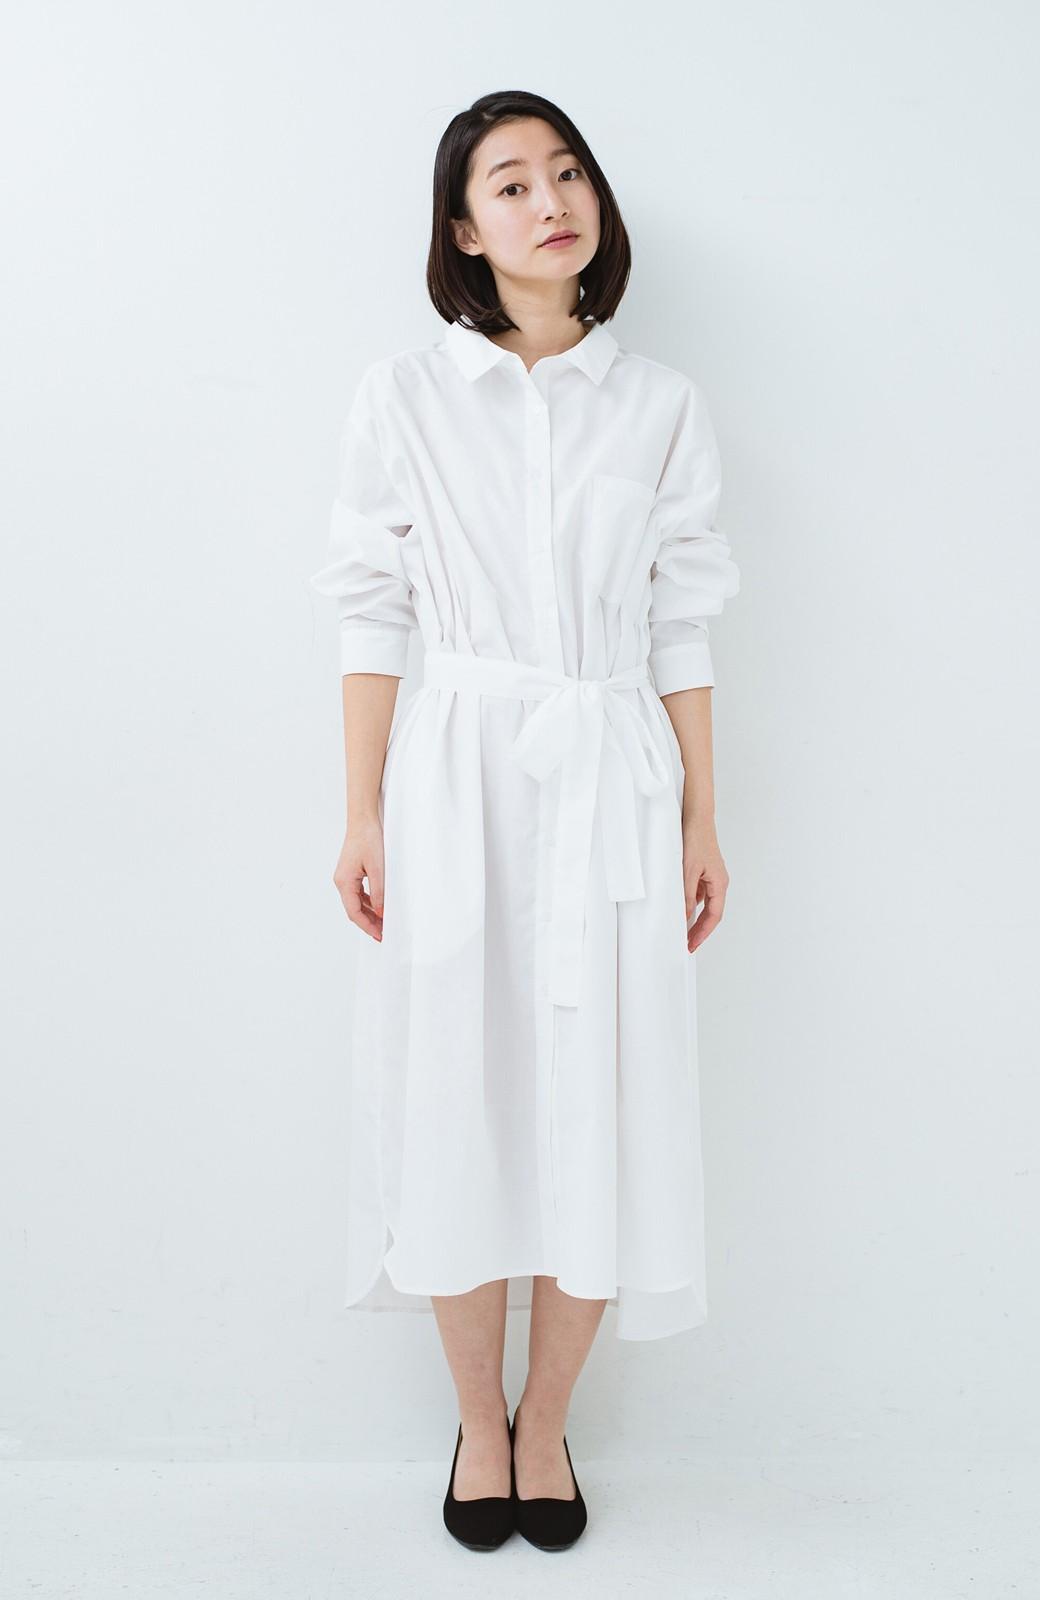 haco! 気持ちが凛と改まる リボン付きオーバーサイズシャツワンピース <ホワイト>の商品写真2